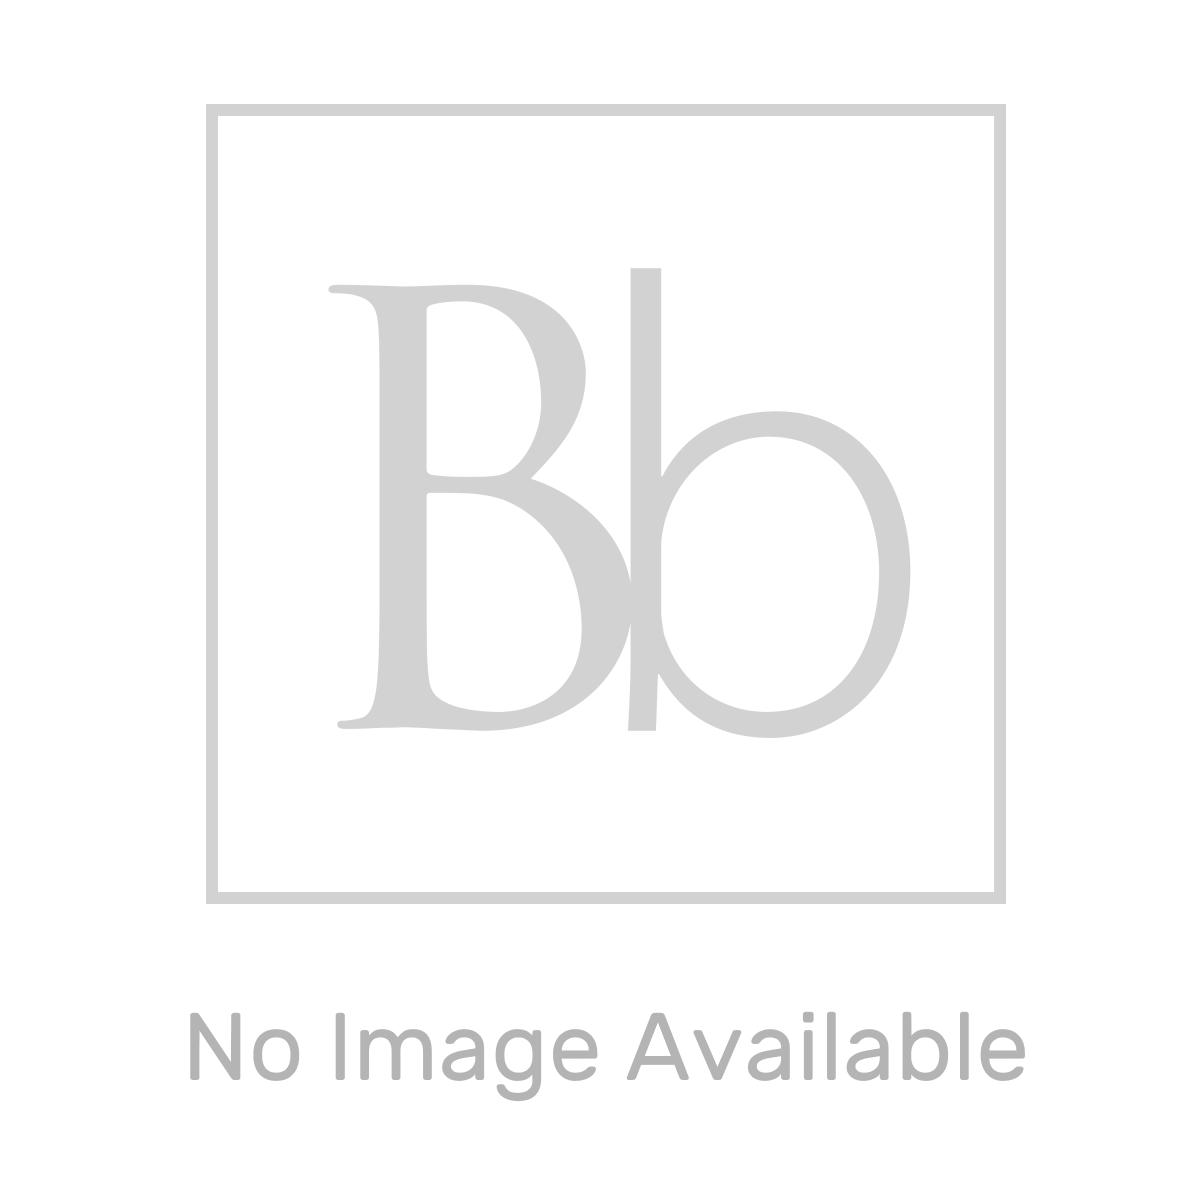 RAK Manhattan Illuminated LED Mirror 700 x 500mm